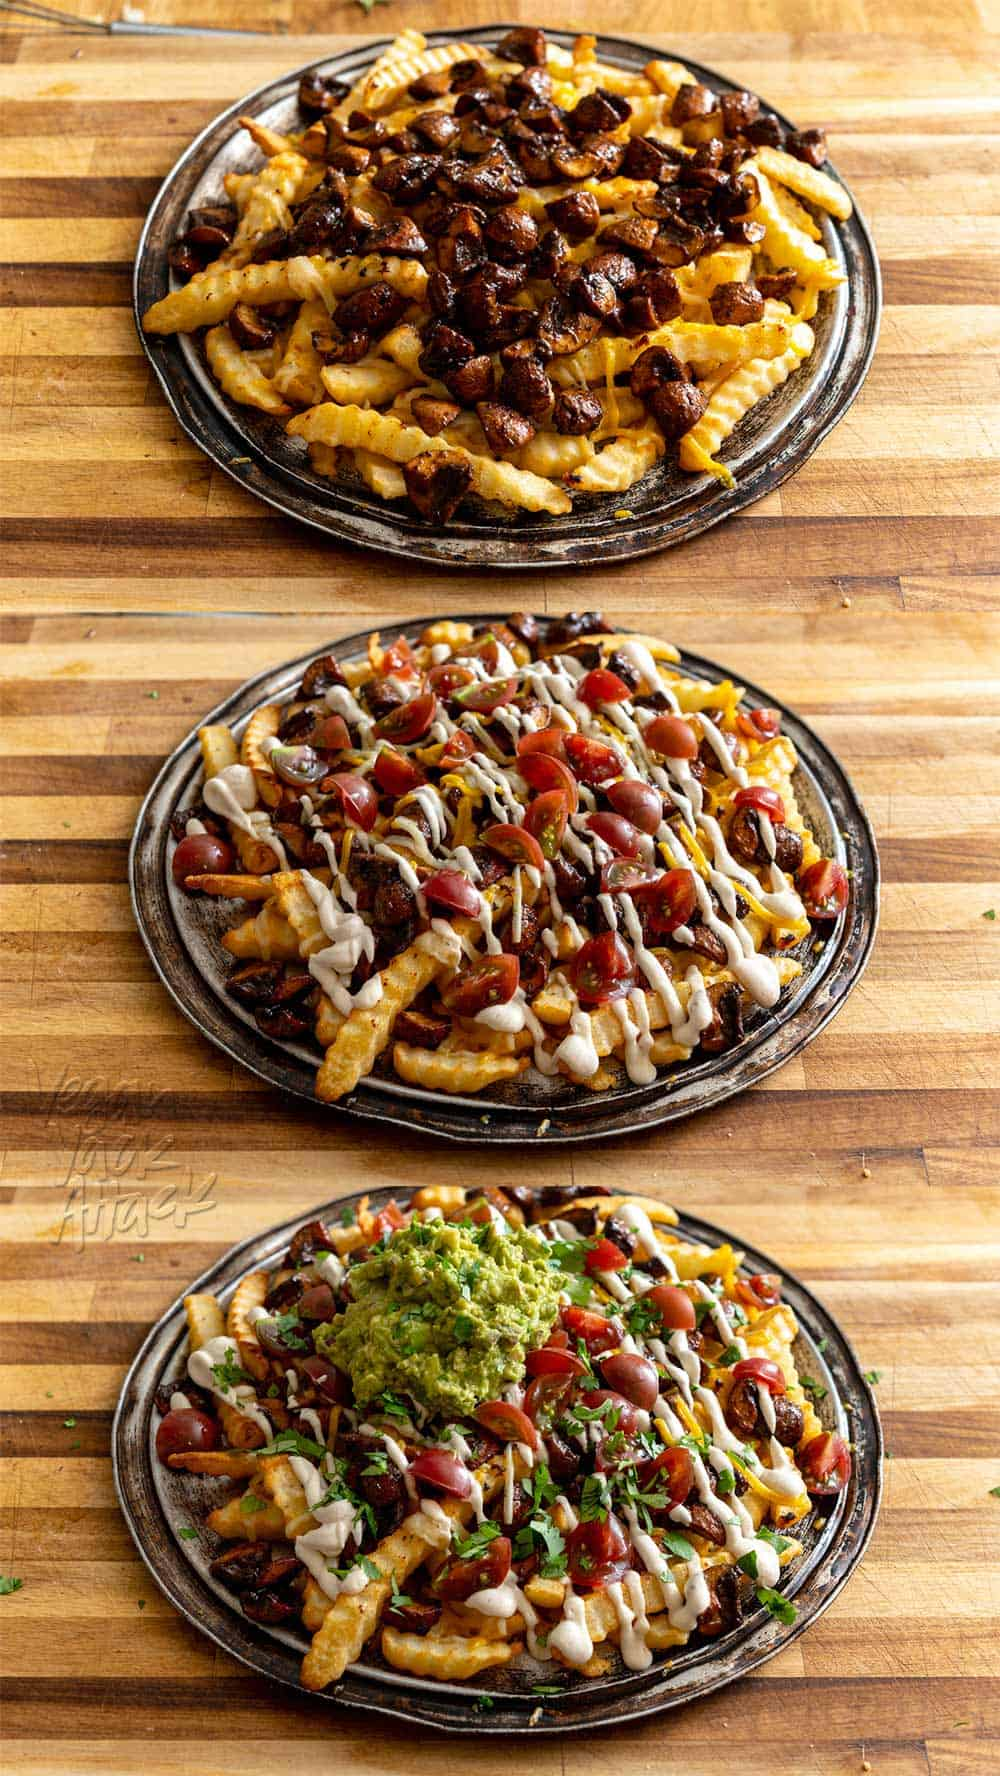 Steps in assembling a platter of mushroom asado fries